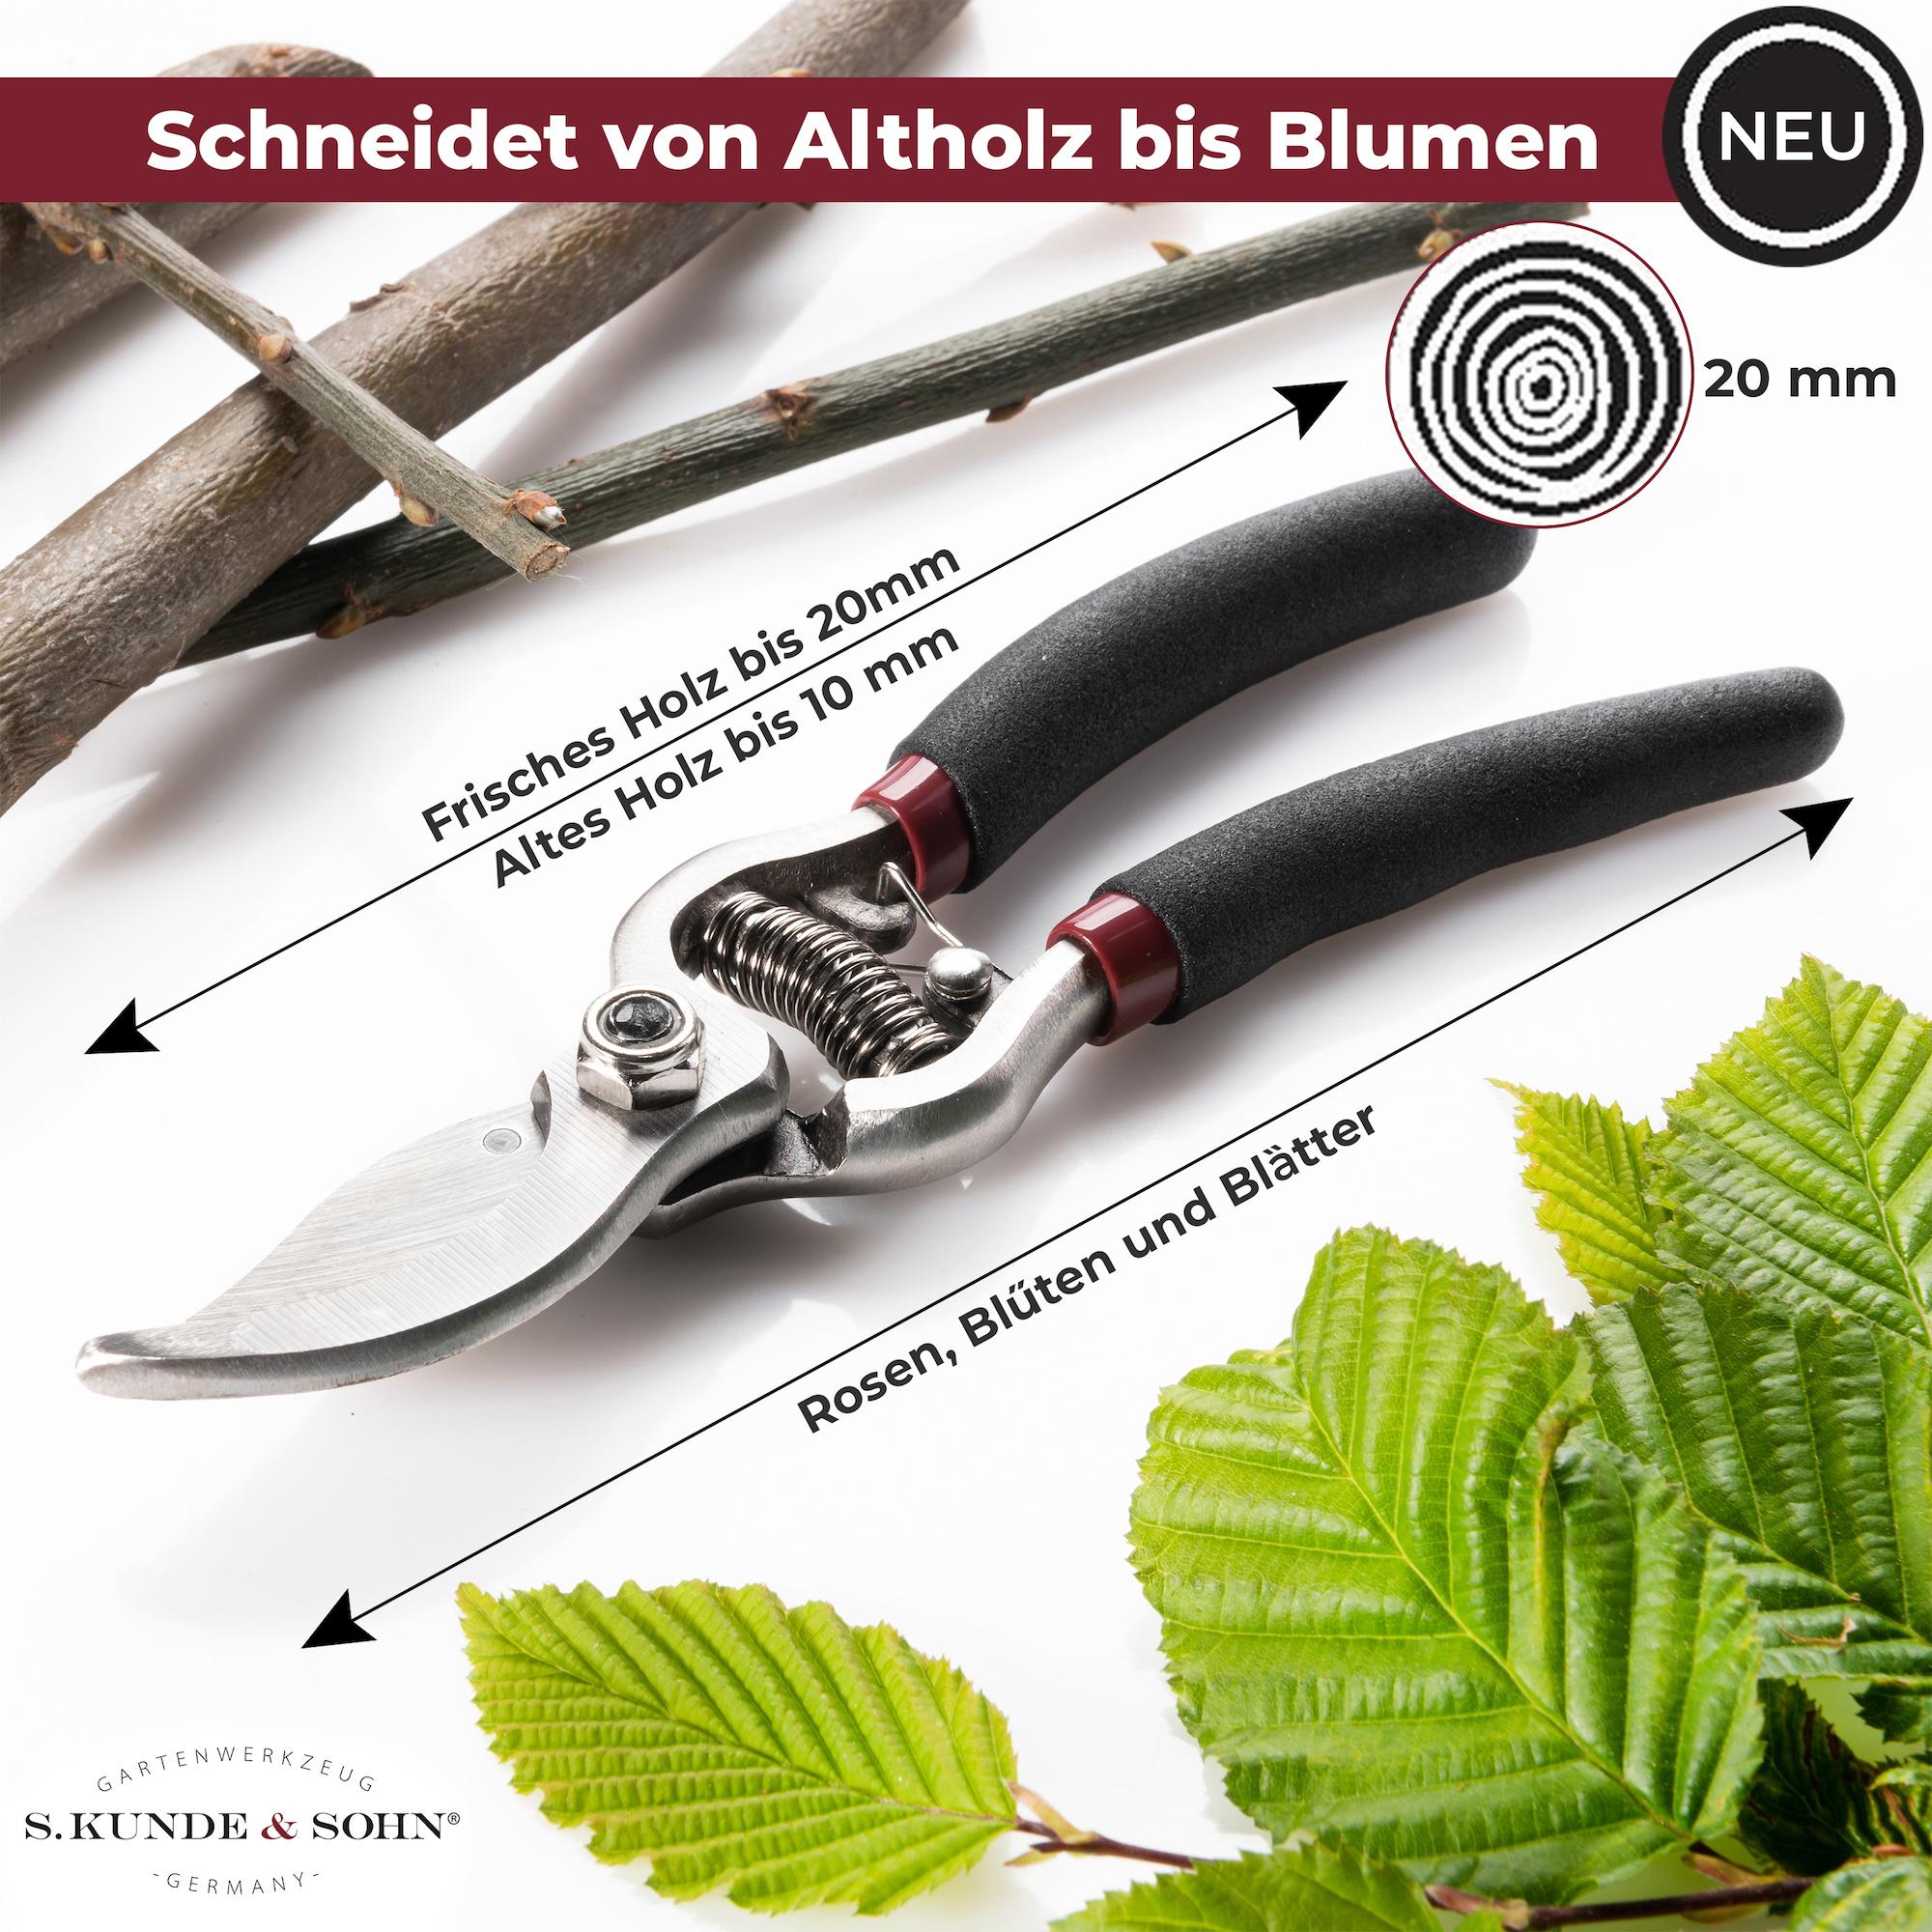 S. Kunde & Sohn Germany SKS 6 Tradition Schwarz/Klinge silber